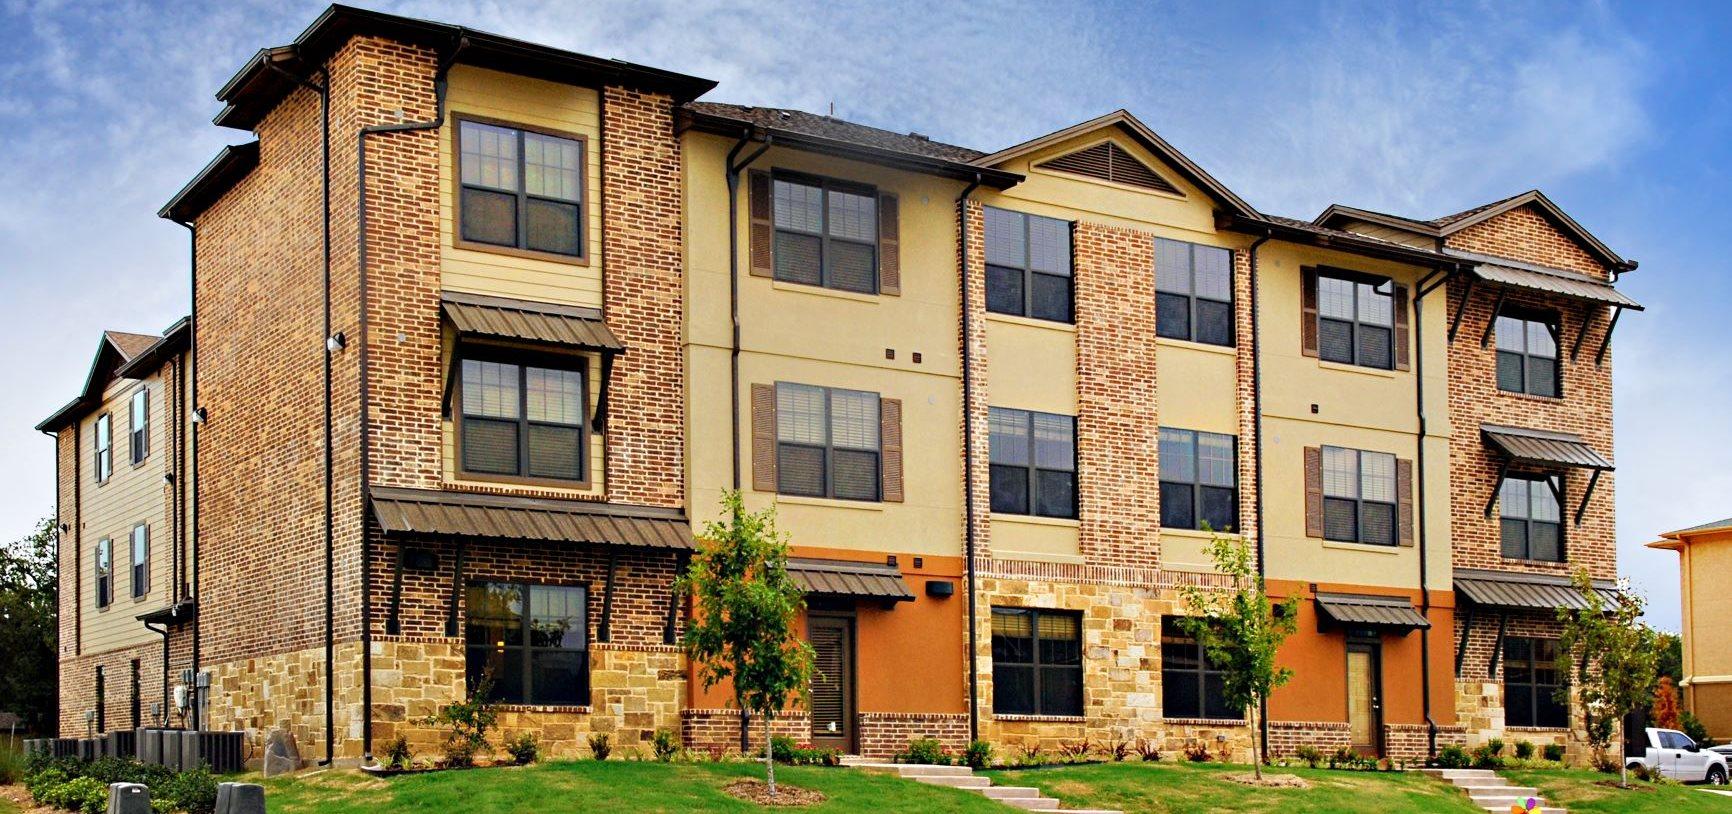 Centre Place Apartments Apartments In Denton Tx